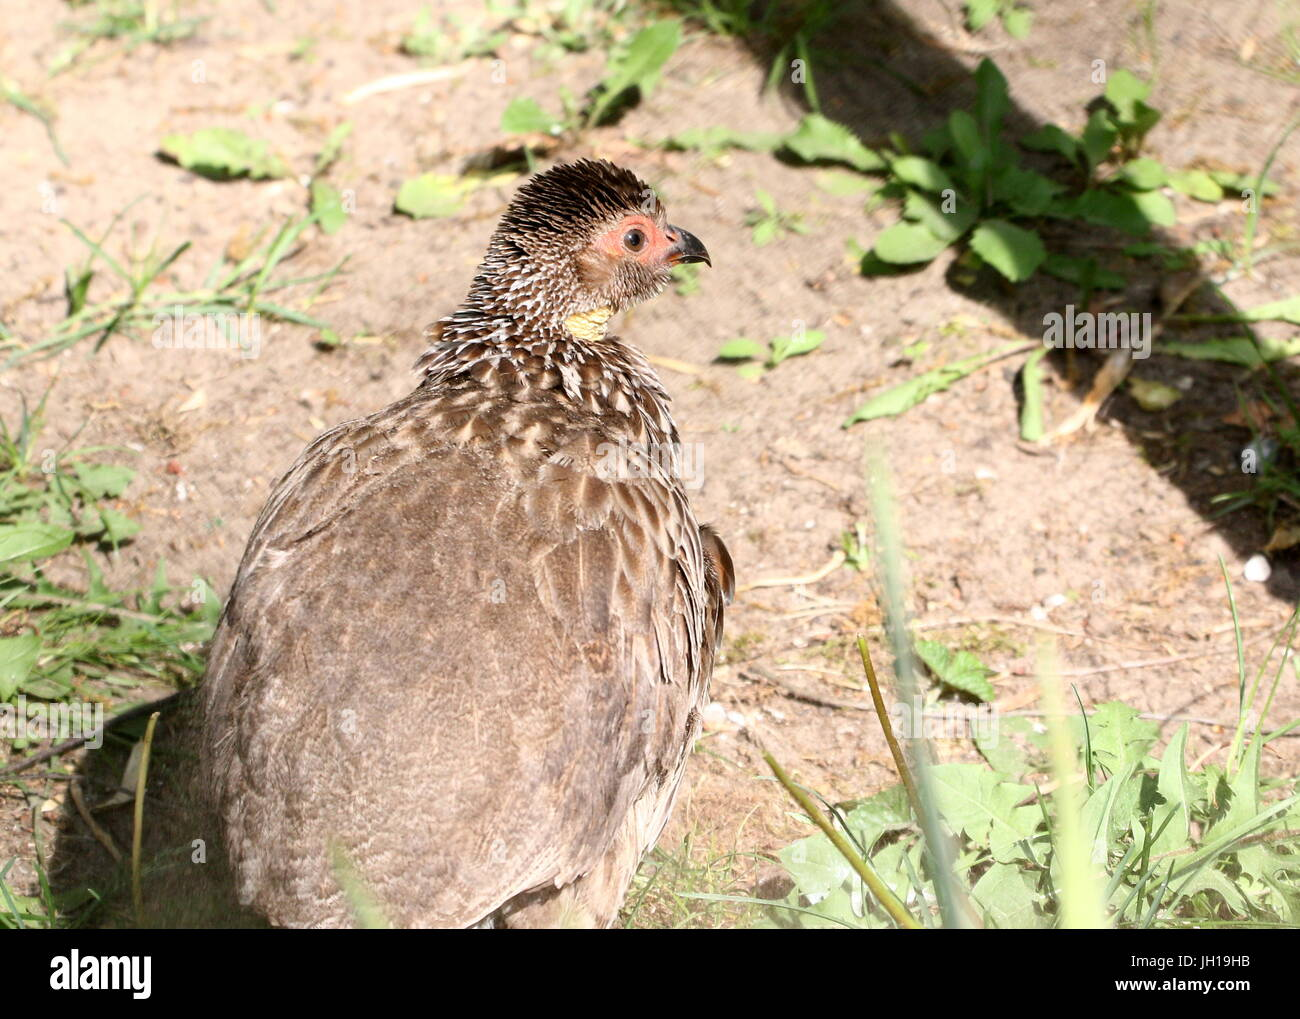 East African Yellow-necked spurfowl (Pternistis leucoscepus,  Francolinus leucoscepus). - Stock Image